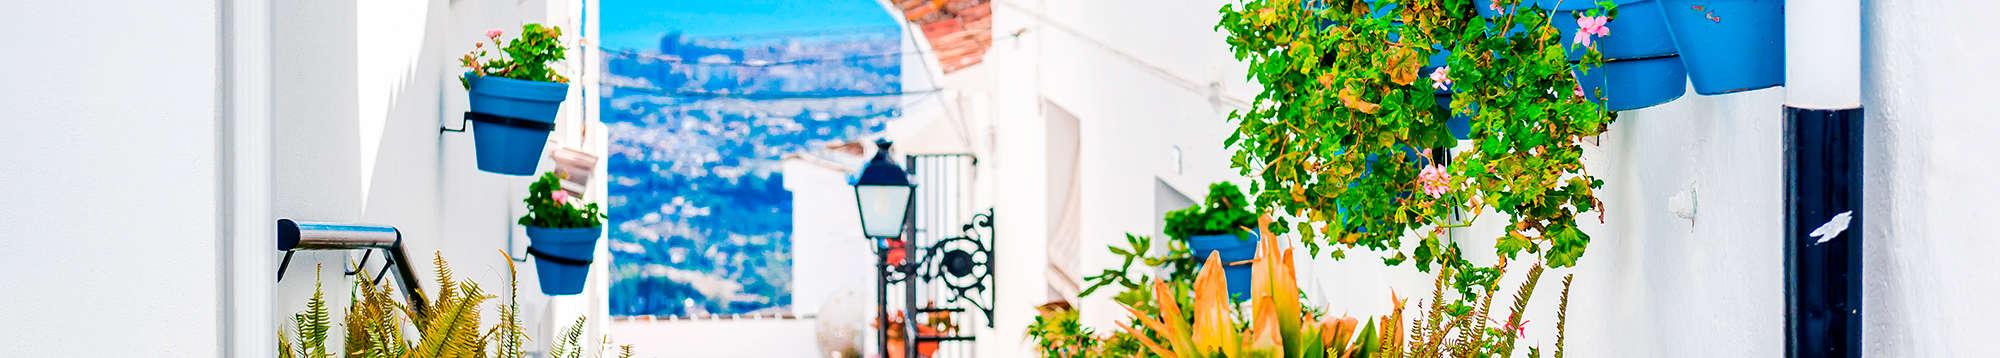 Week-end et séjour Fuengirola